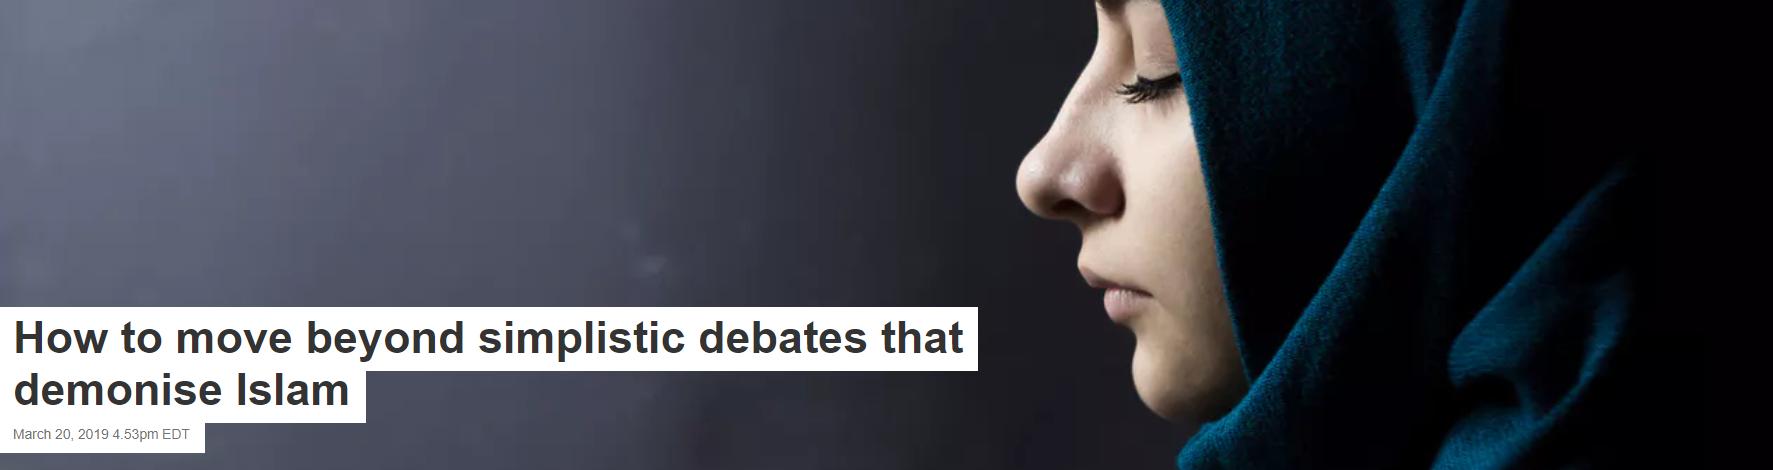 How to move beyond simplistic debates that demonize Islam